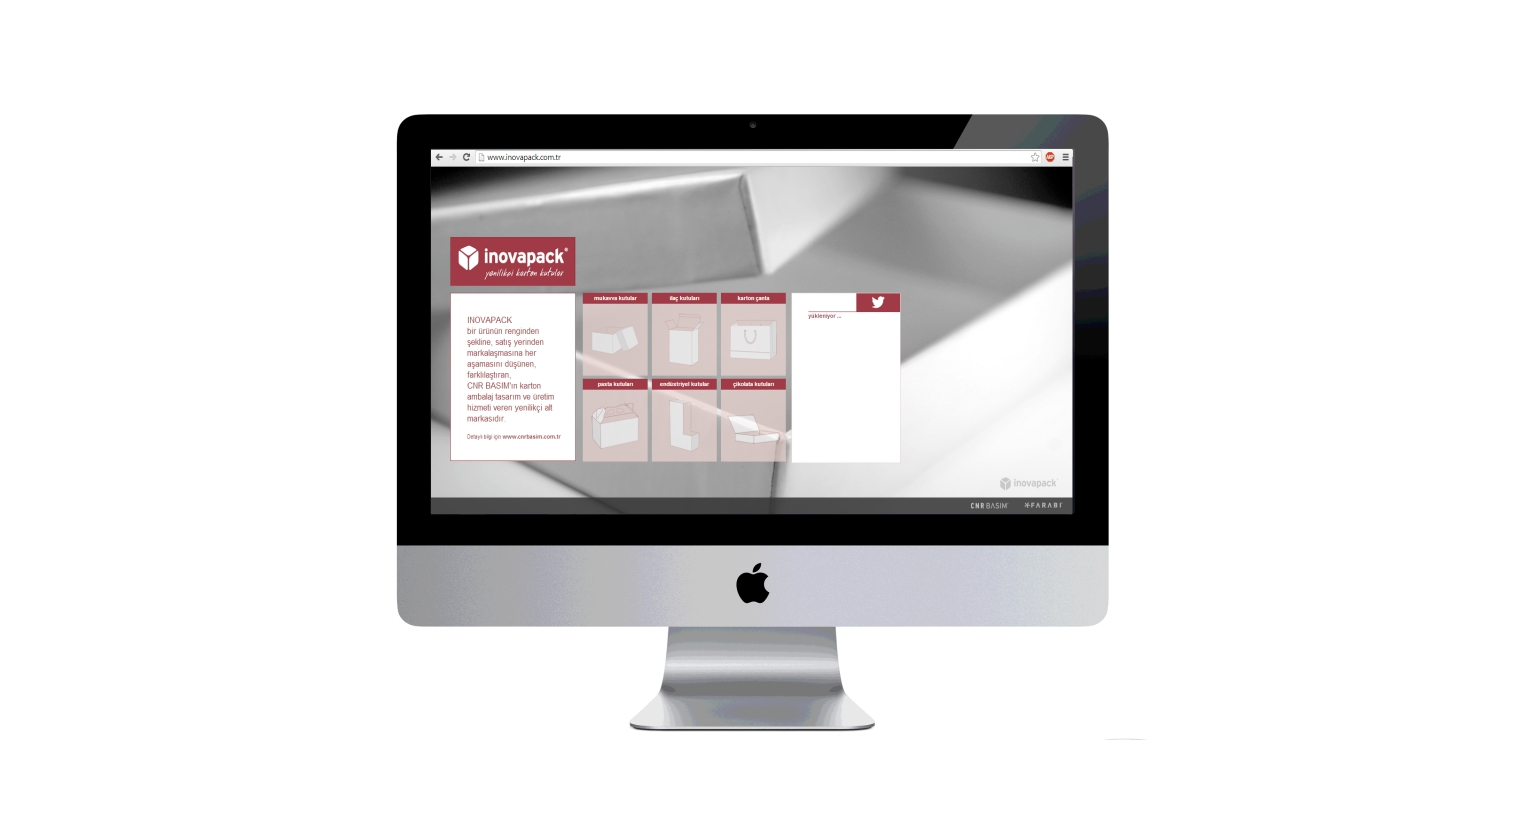 inovapack web